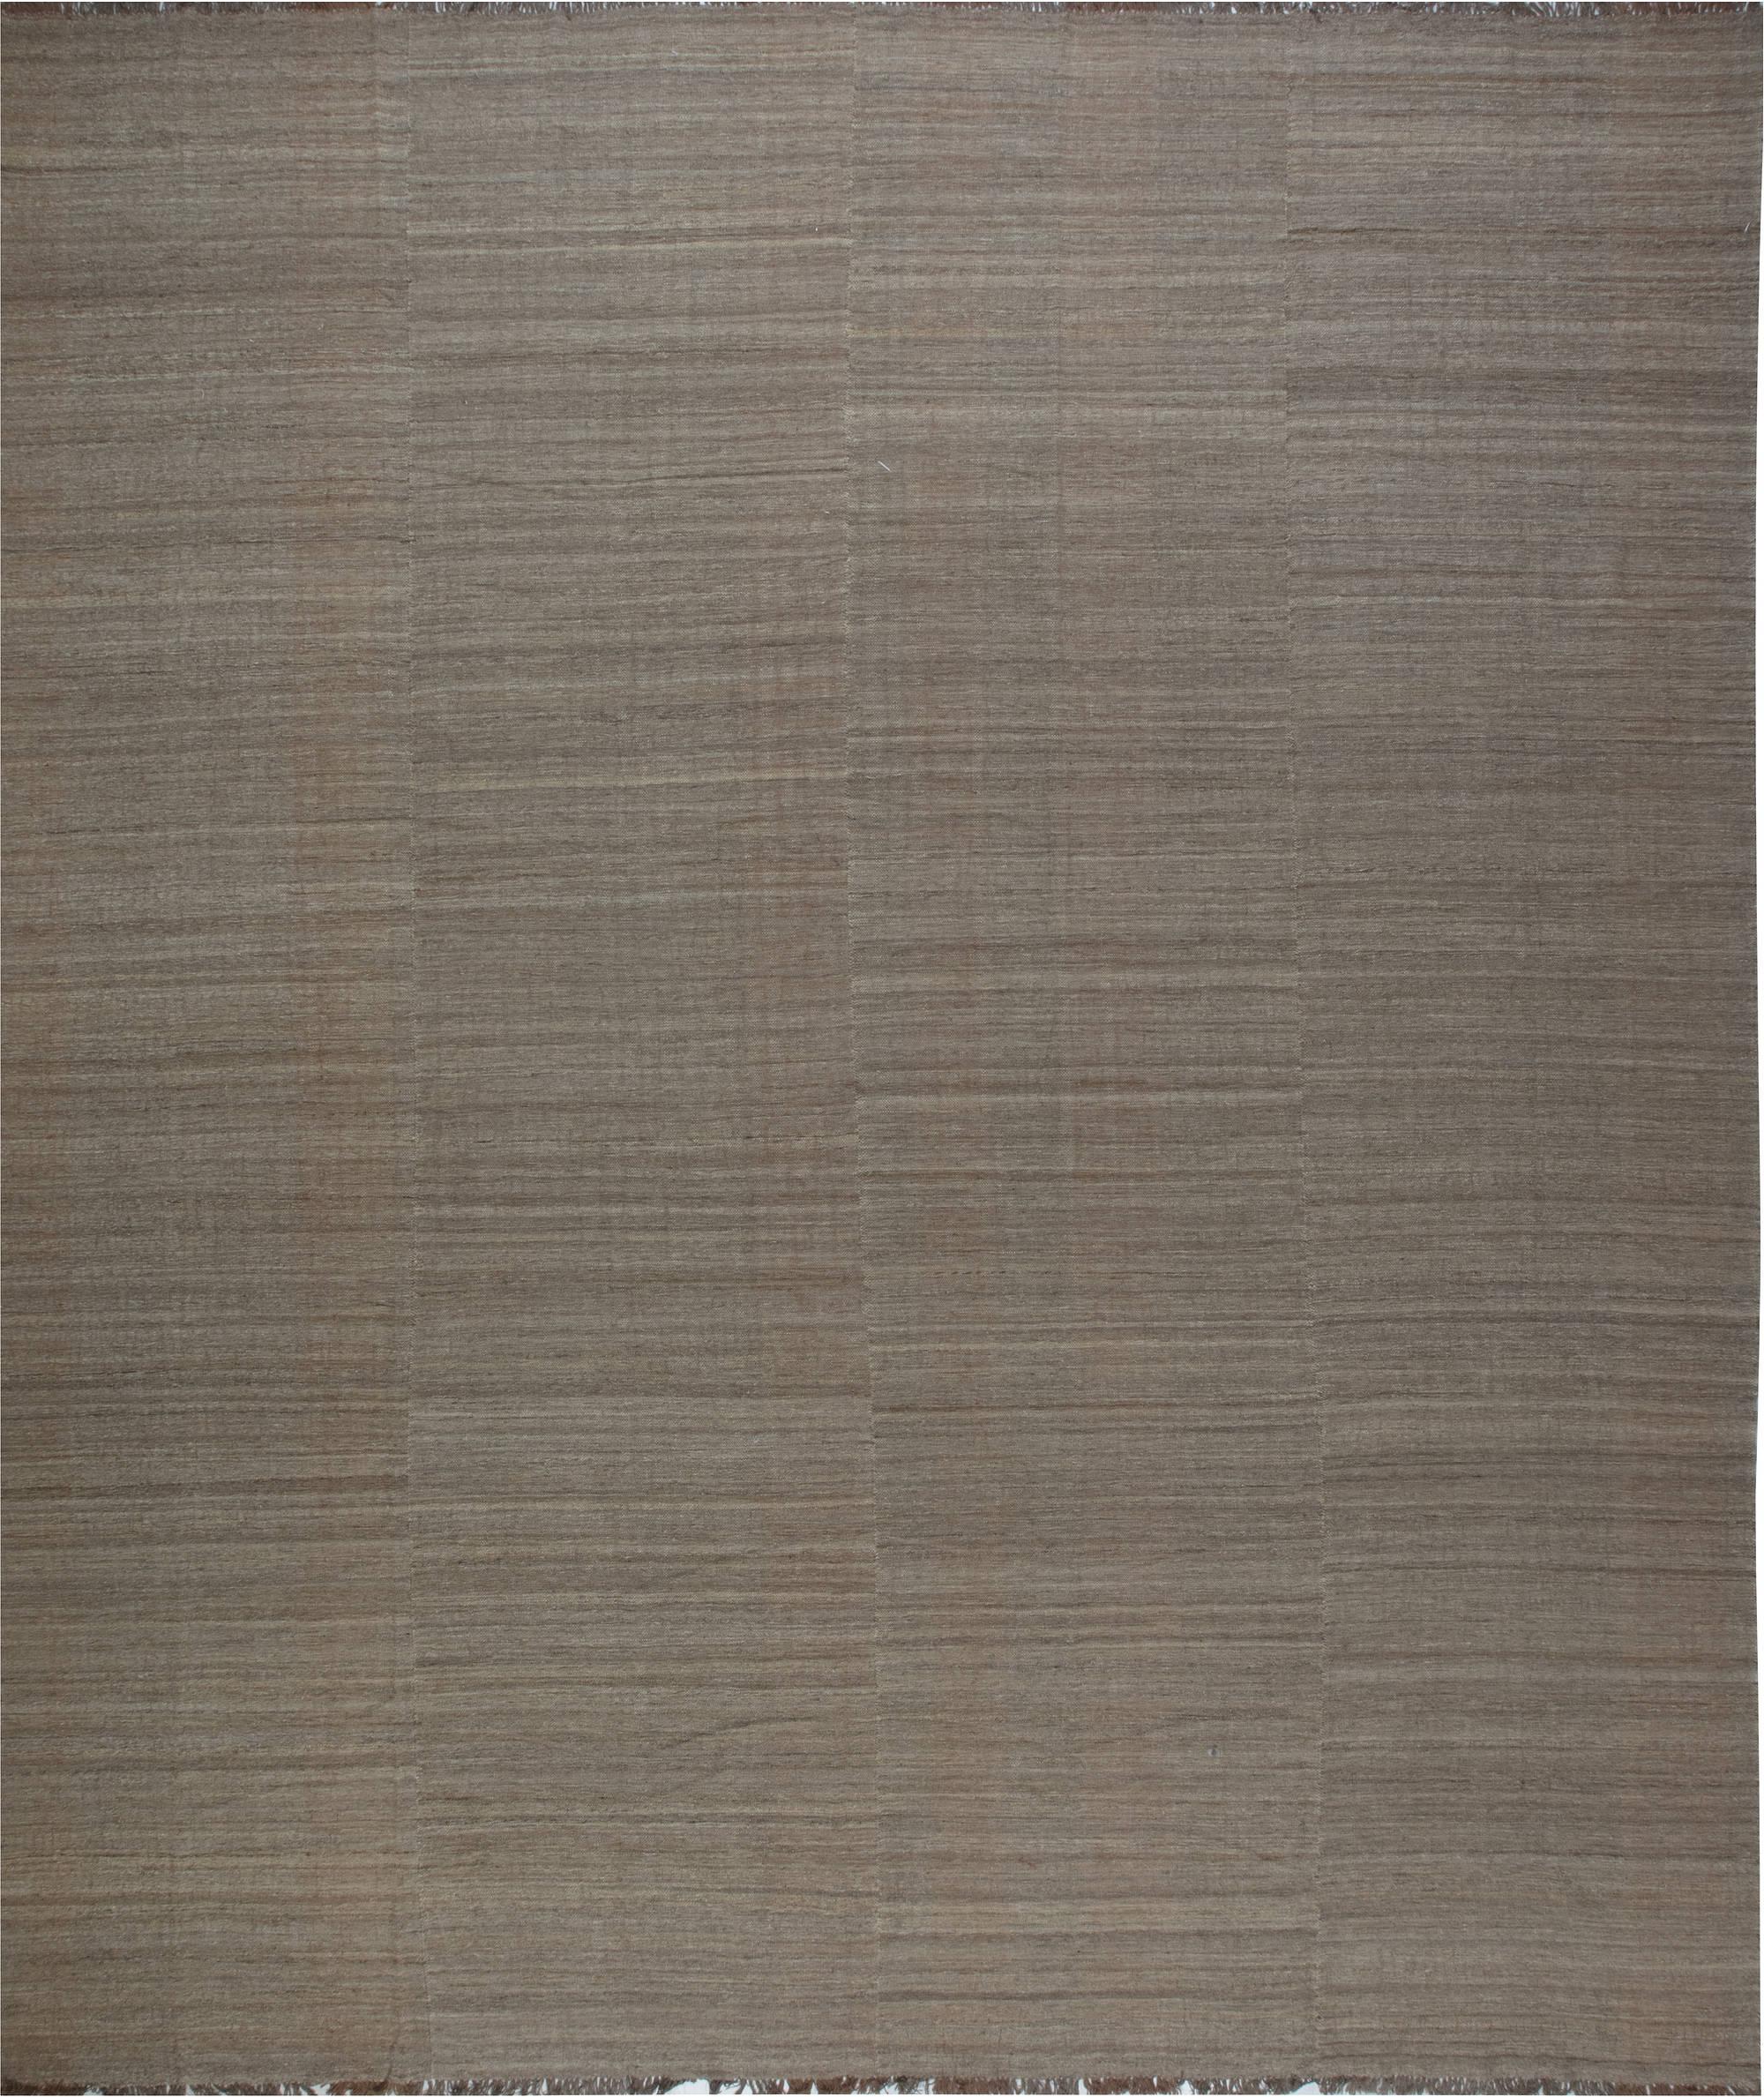 Contemporary Flat Weave Kilim Rug